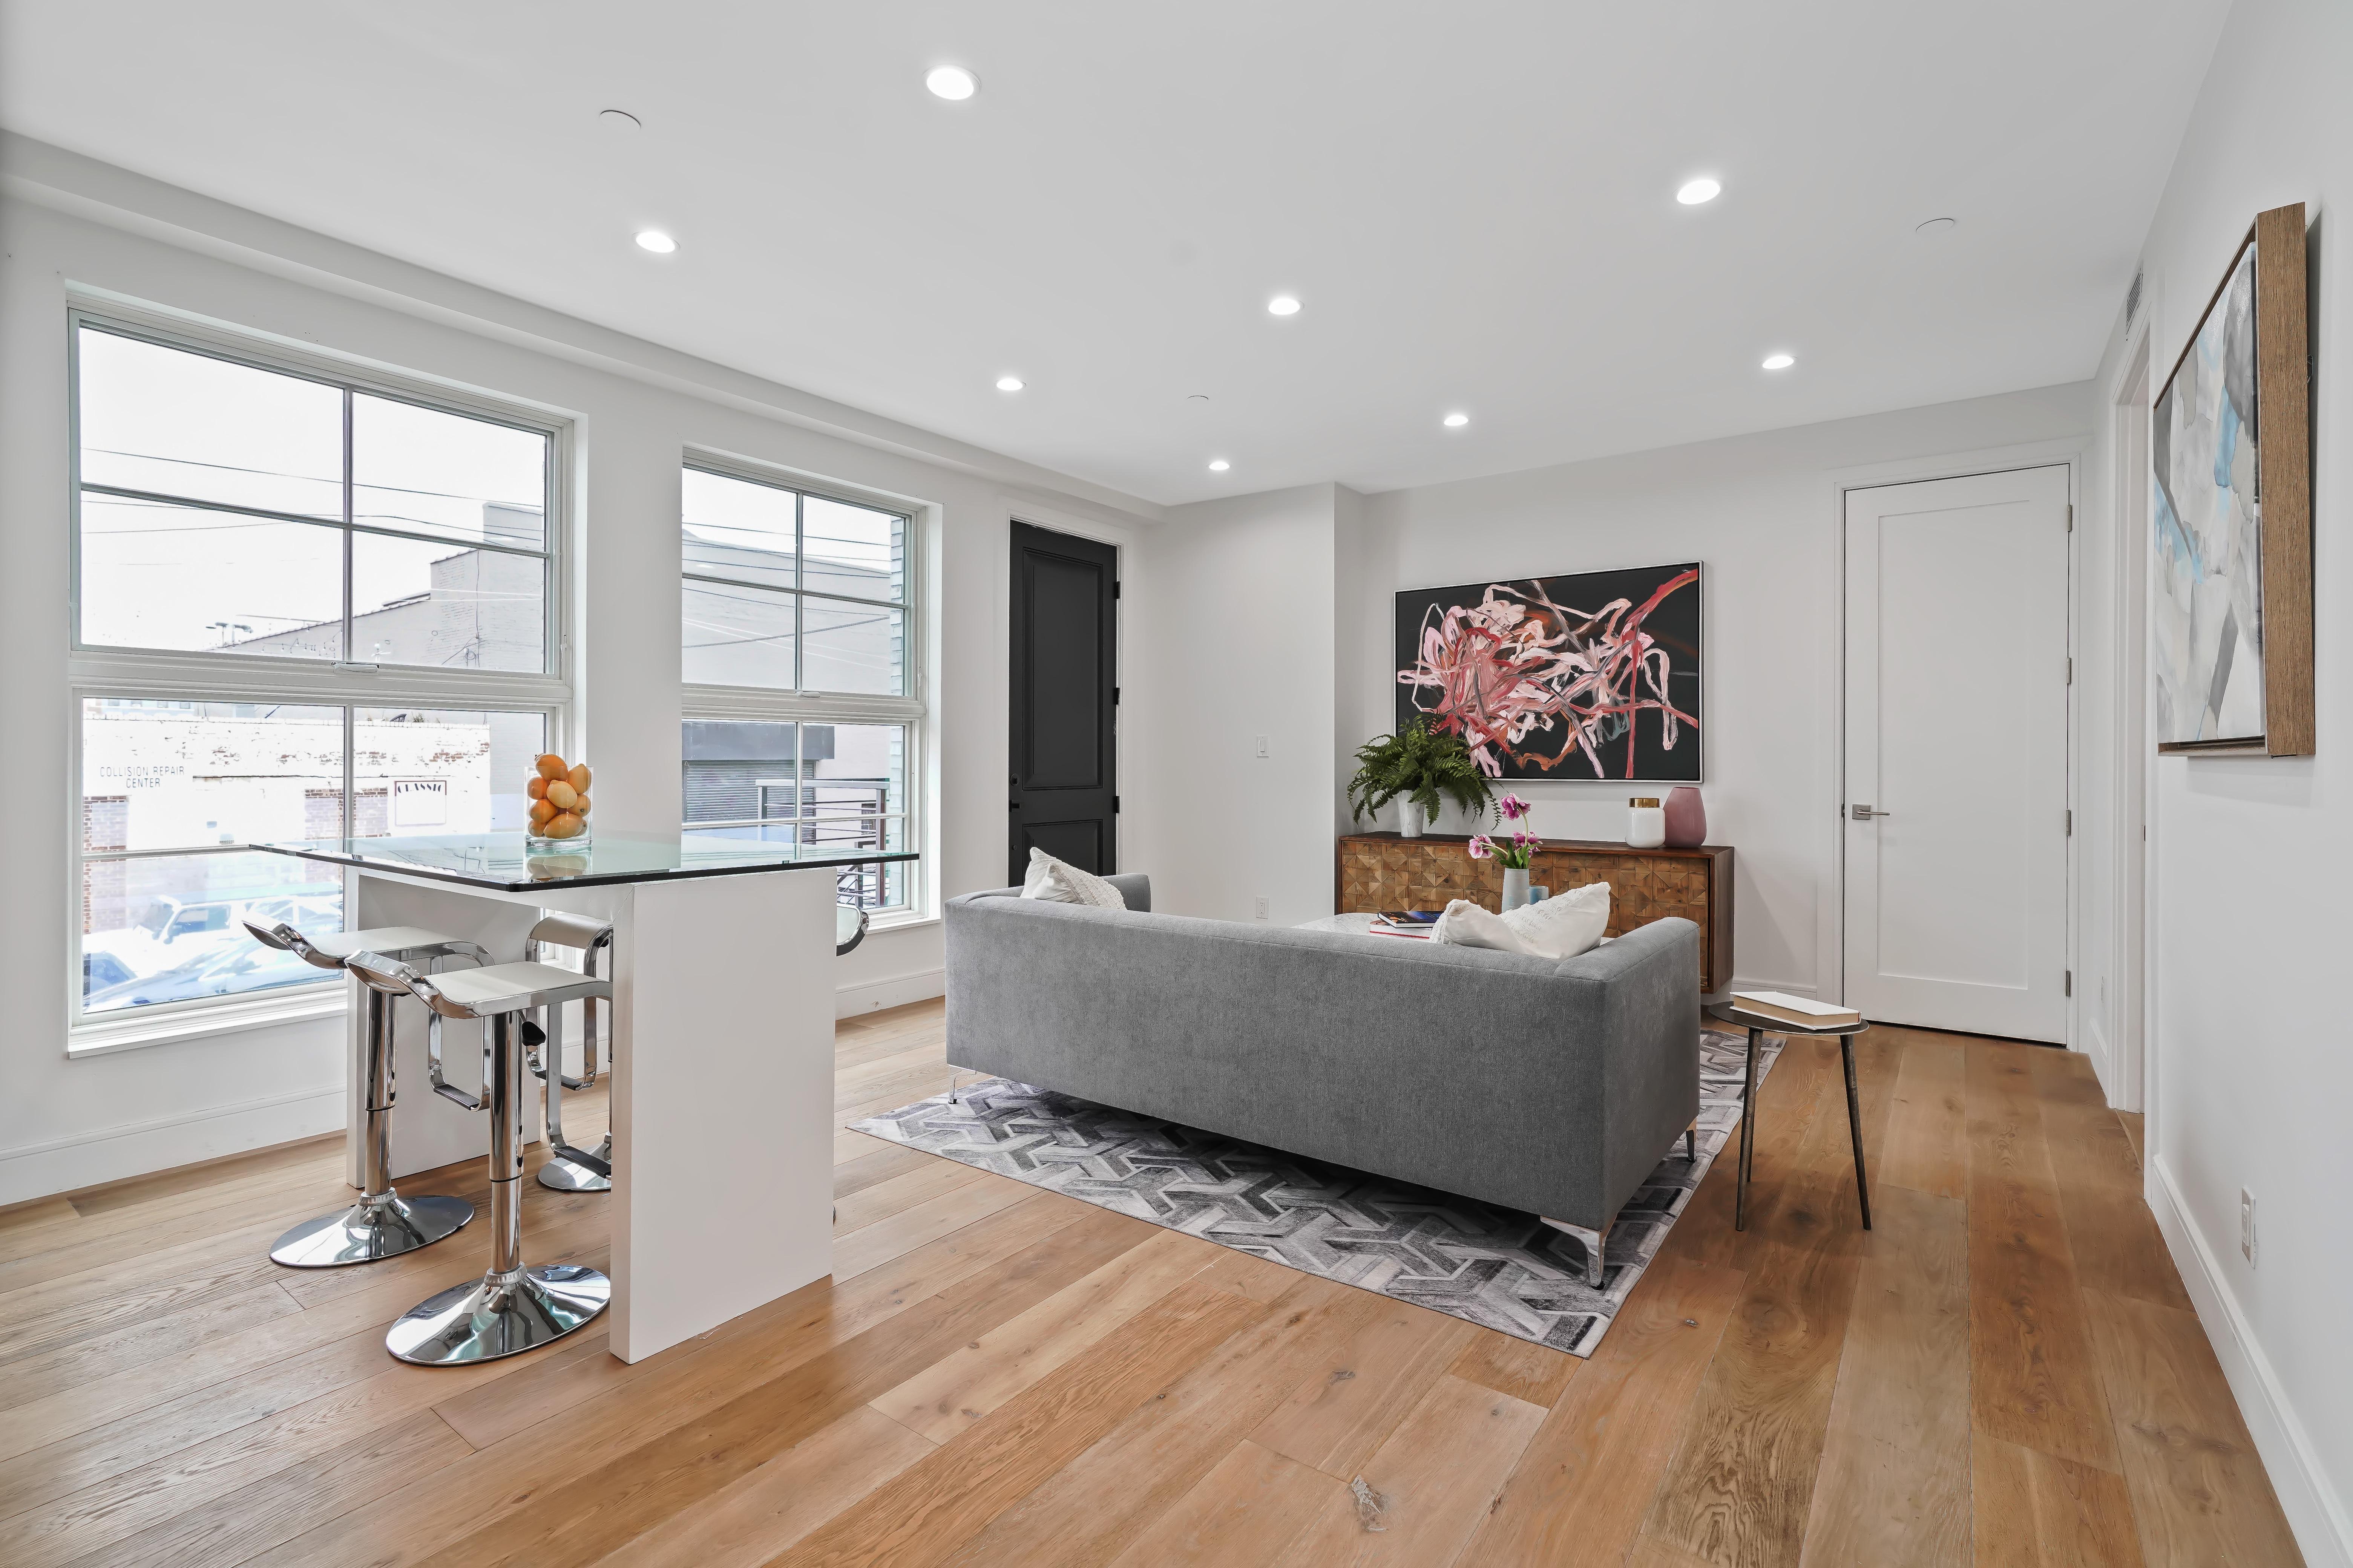 Apartment for sale at 40 Huntington Street, Apt 1E